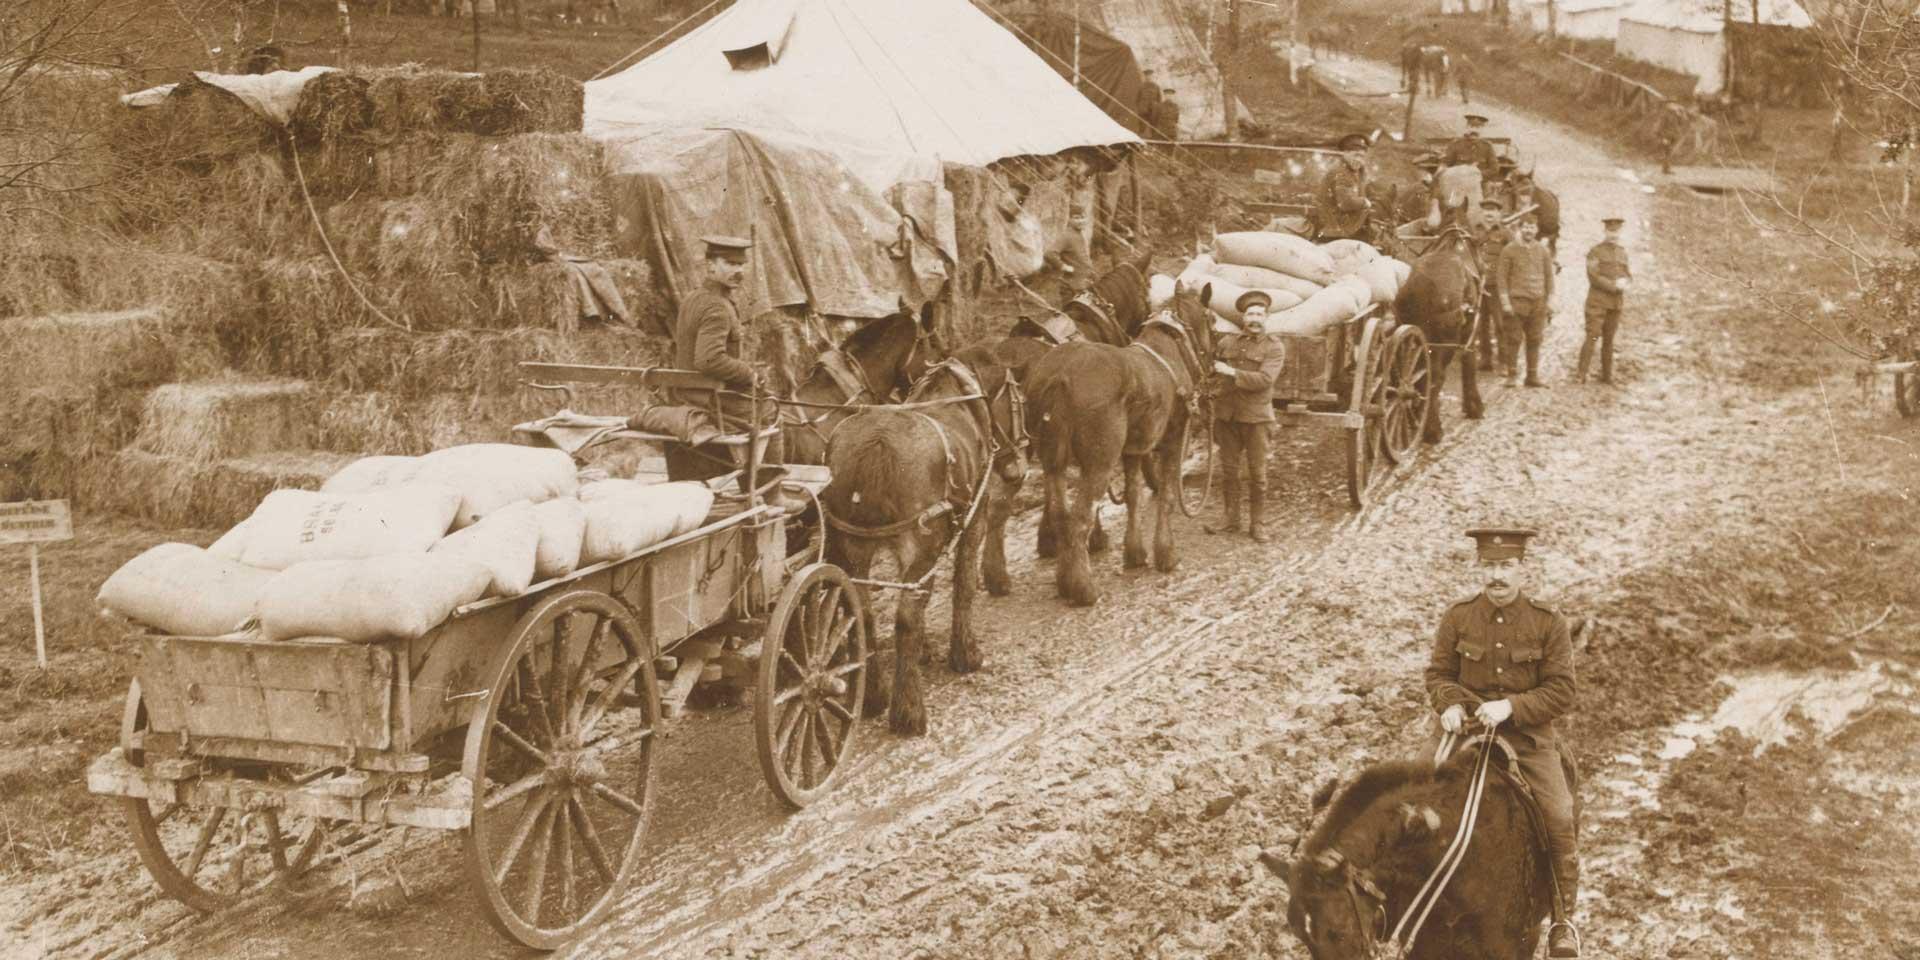 Bringing supplies into camp, c1916